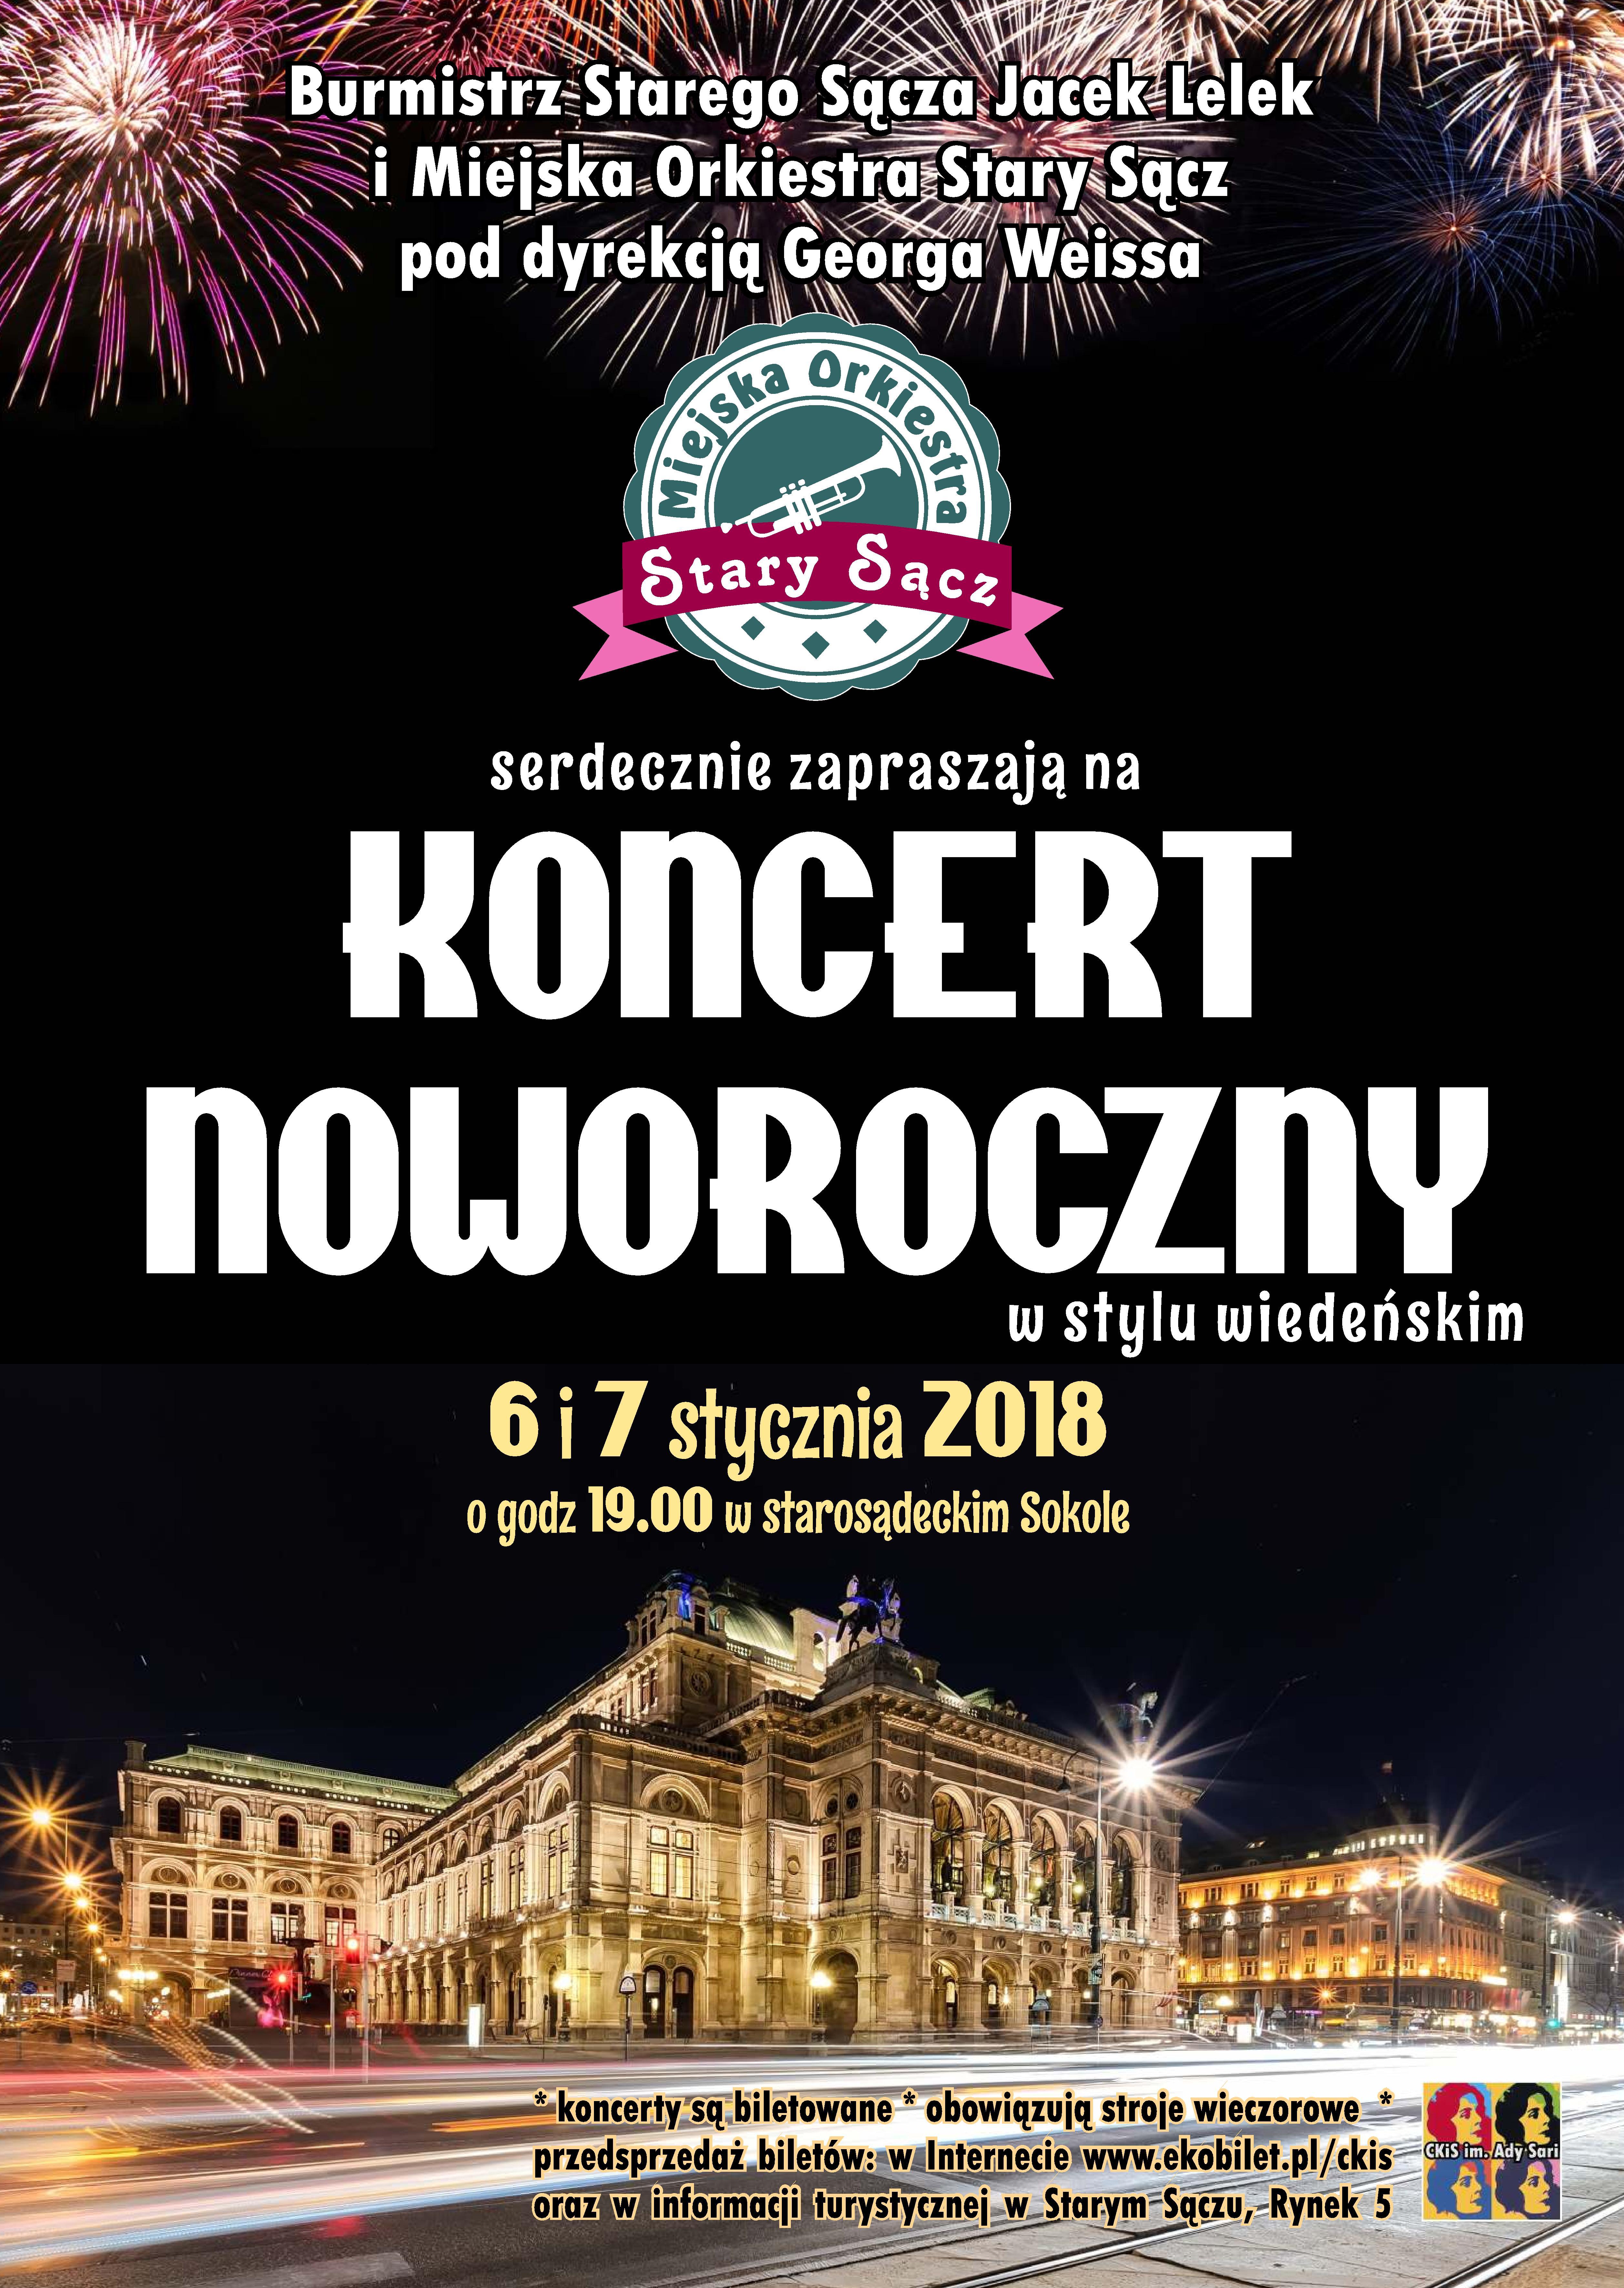 Plakat A2 Koncert Noworoczny Krzywe 2018 Page 001 Centrum